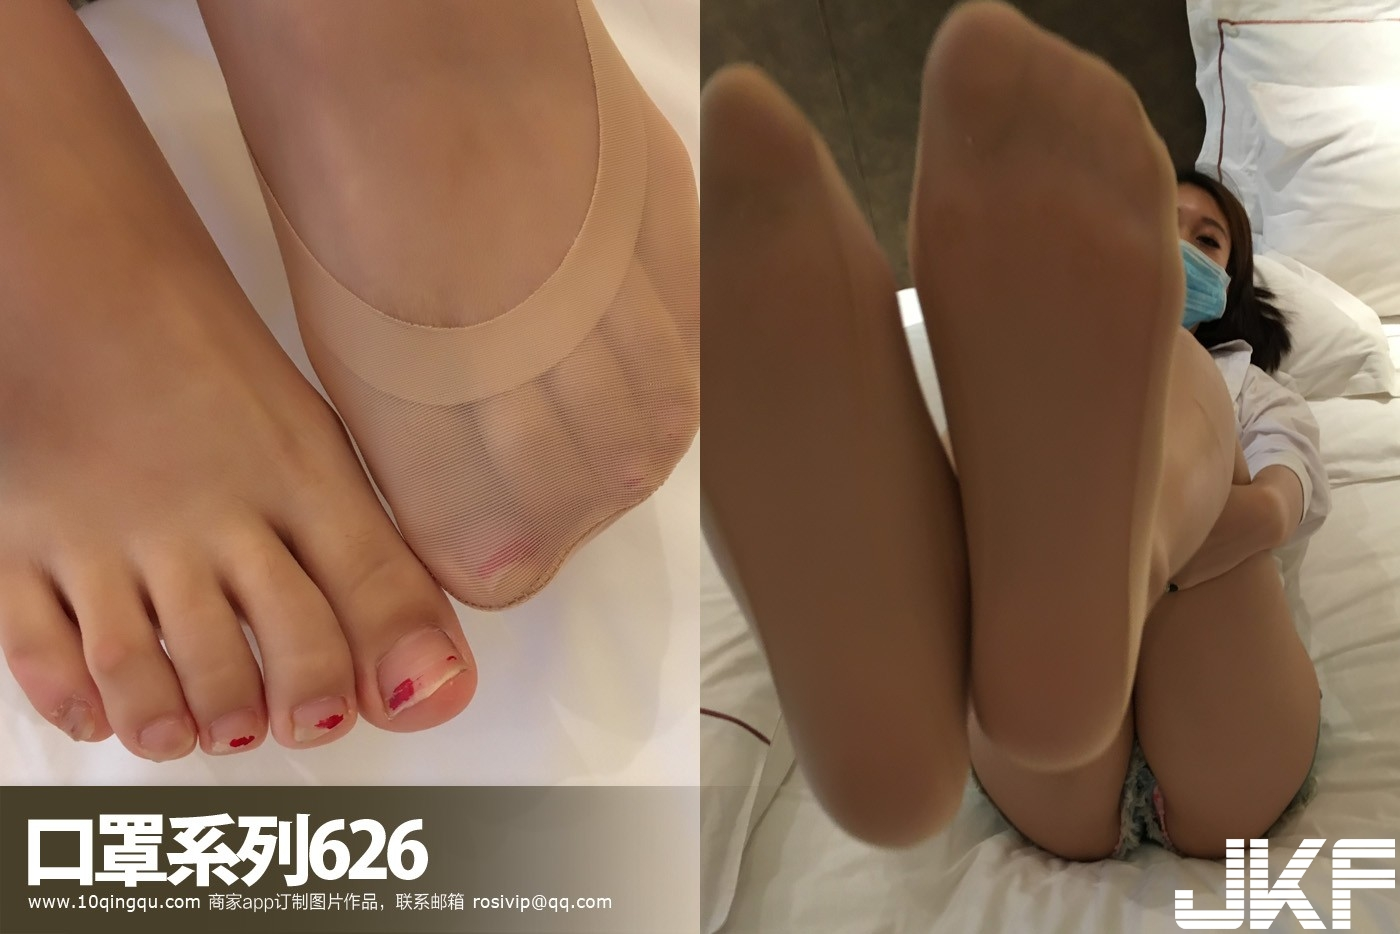 [ROSI寫真] 口罩系列 2018.02.28 NO.626 [55P] - 貼圖 - 絲襪美腿 -